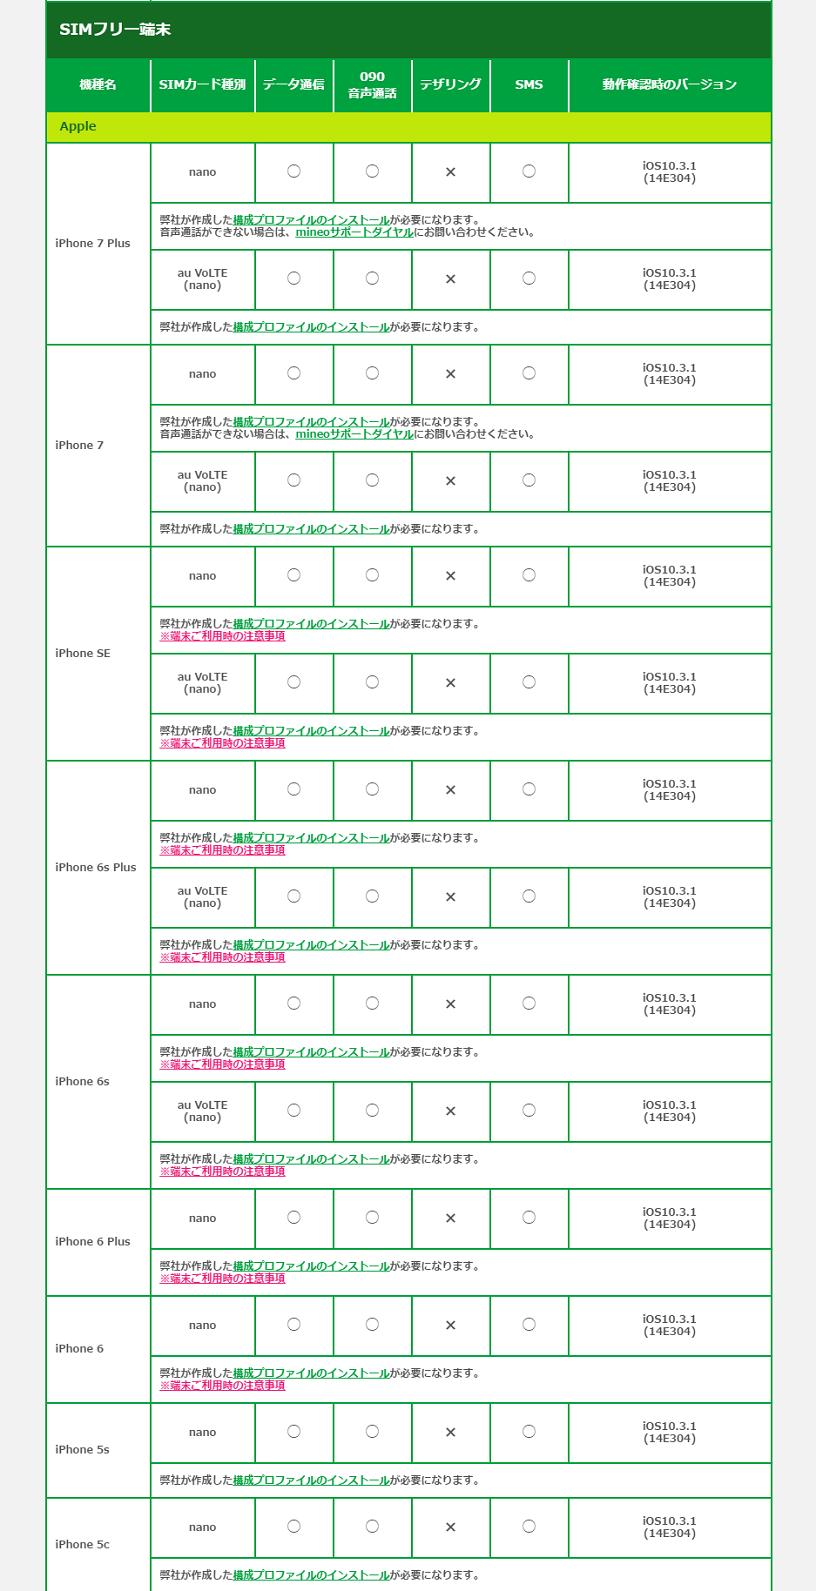 17051_auプラン動作確認端末simfree I mineo.jp